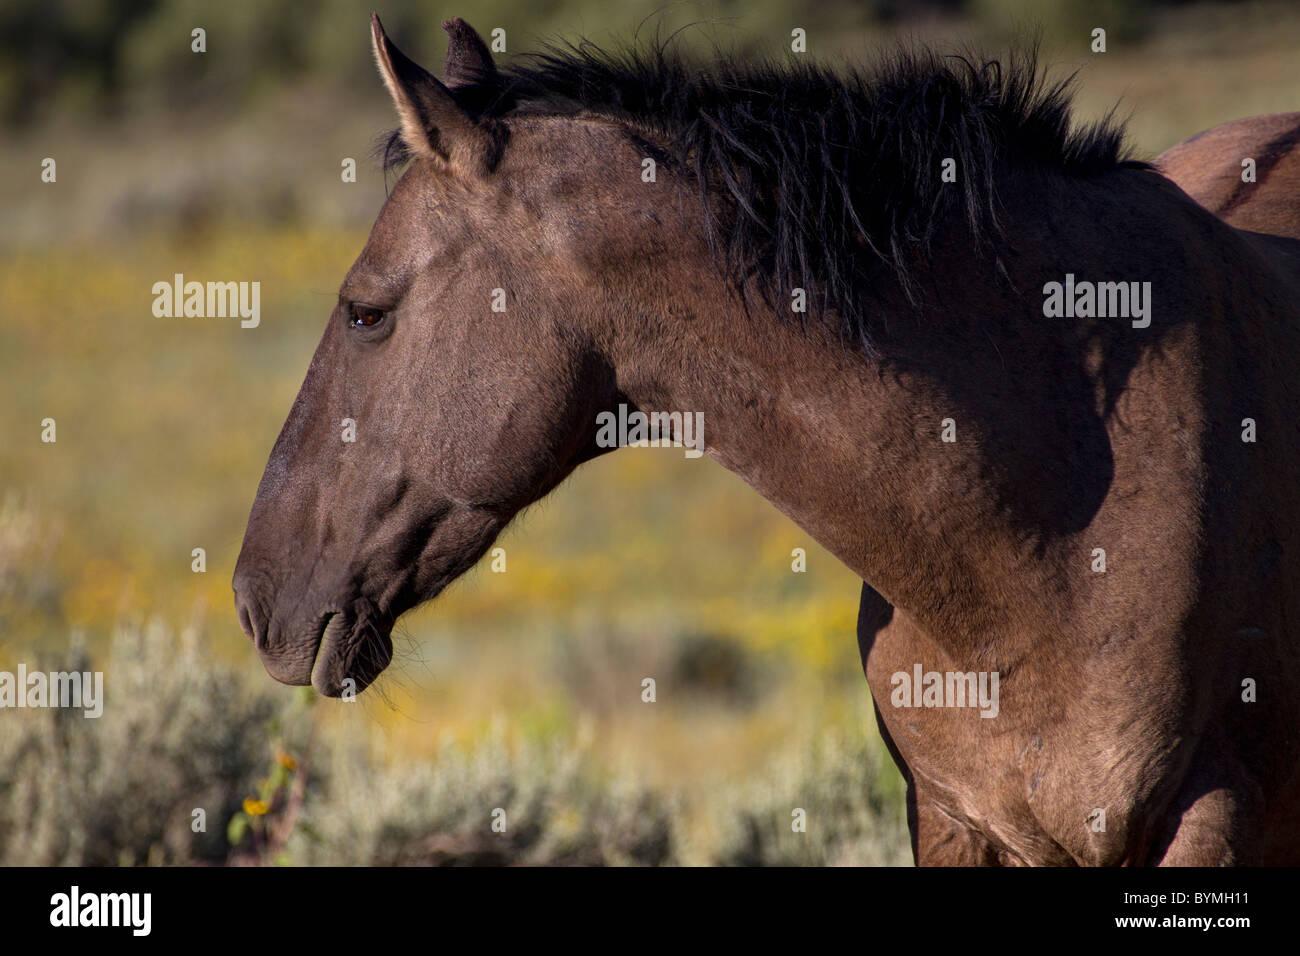 Bay Mustang Stallion Profile - Stock Image